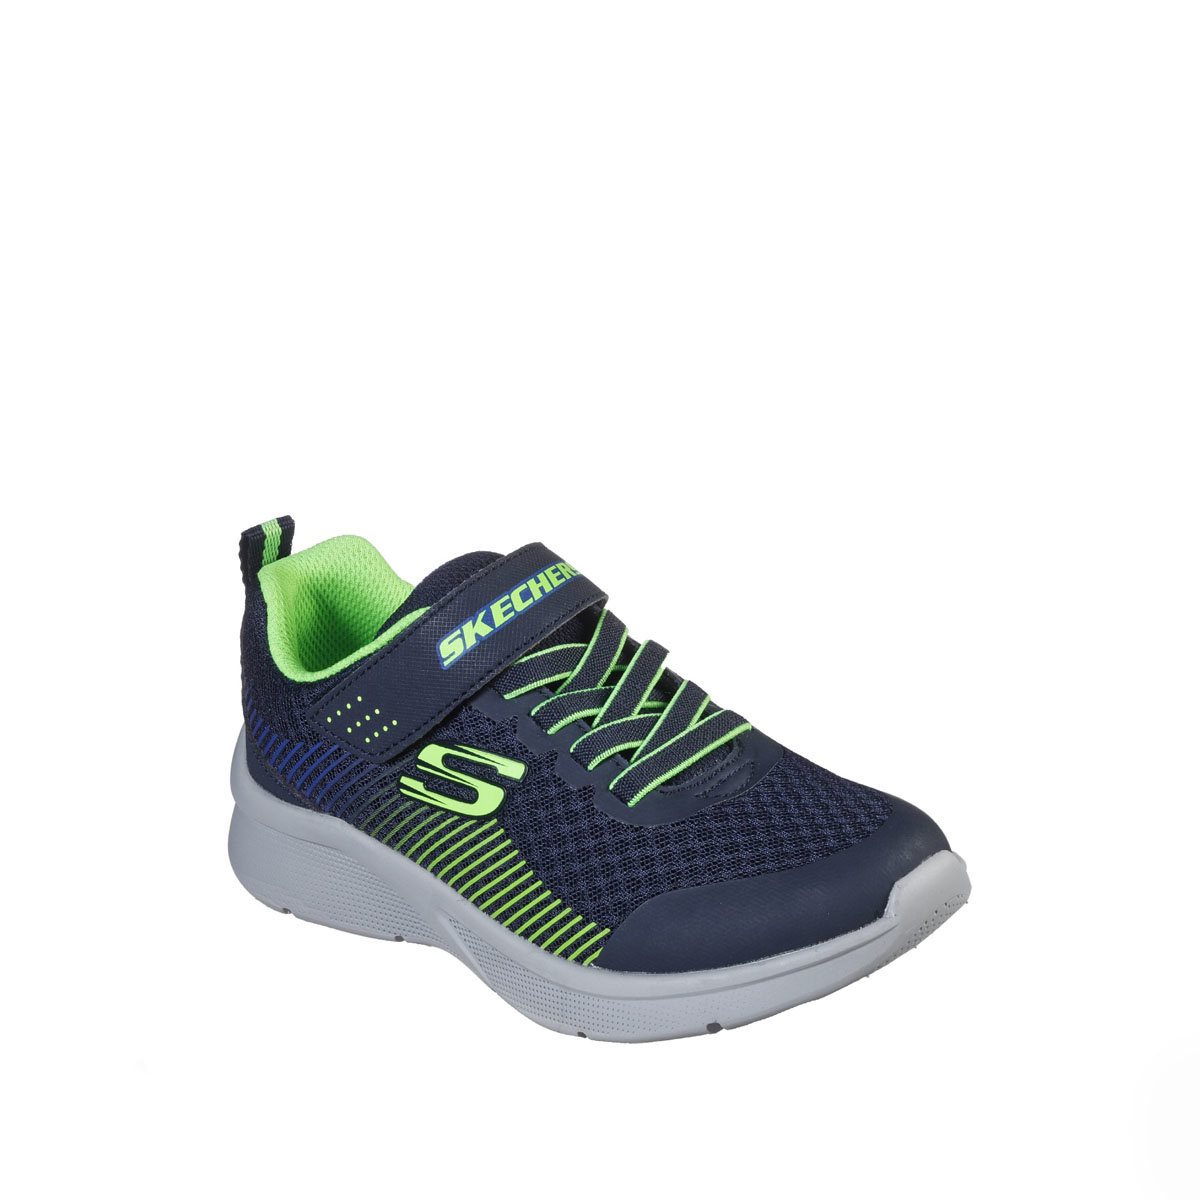 Skechers Gorza Navy Lime